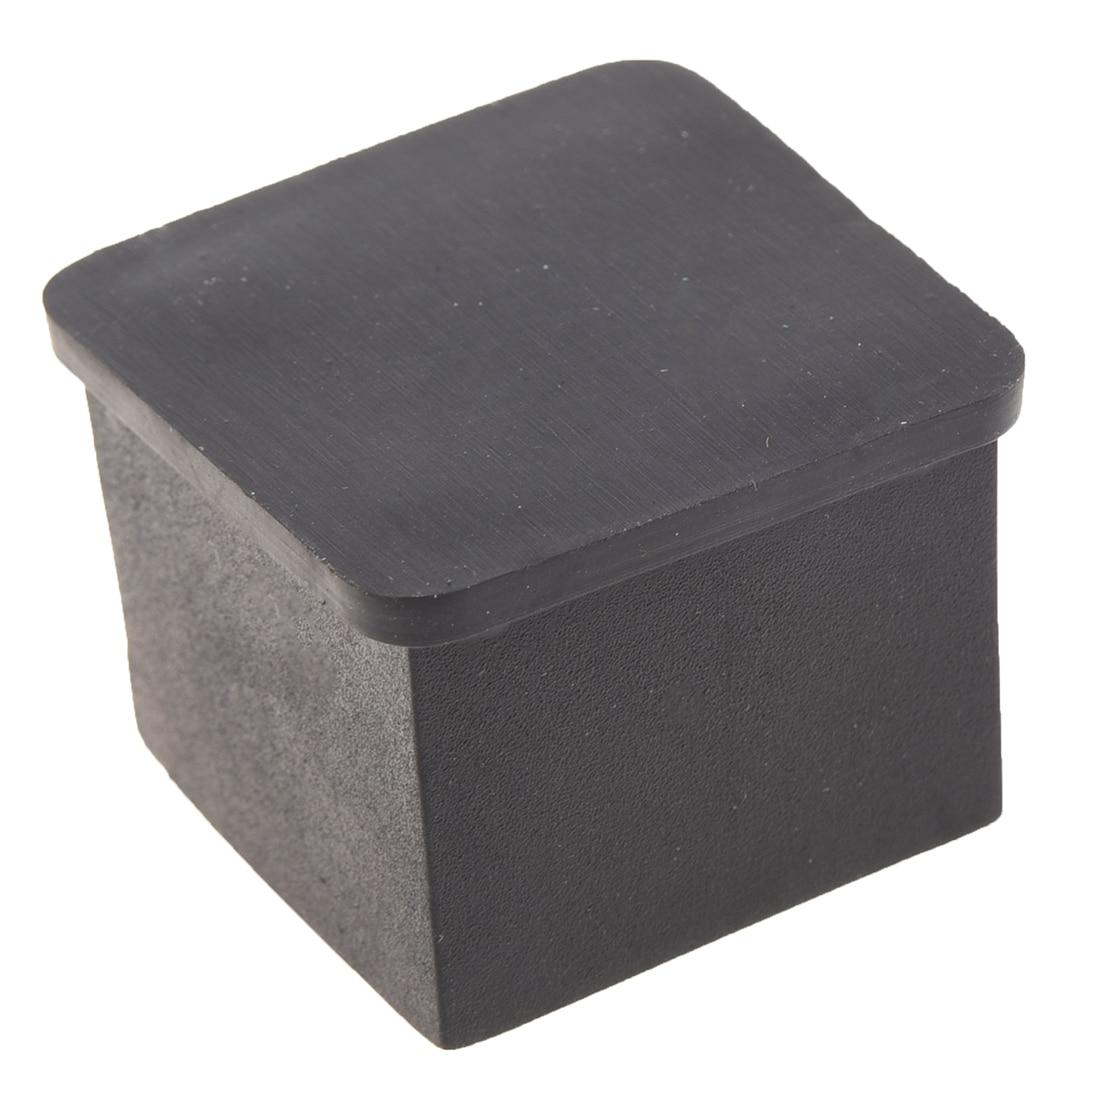 Hot Sale 15Pcs Black Rubber 30mmx30mm Square Chair Foot Cover Chair Leg Caps